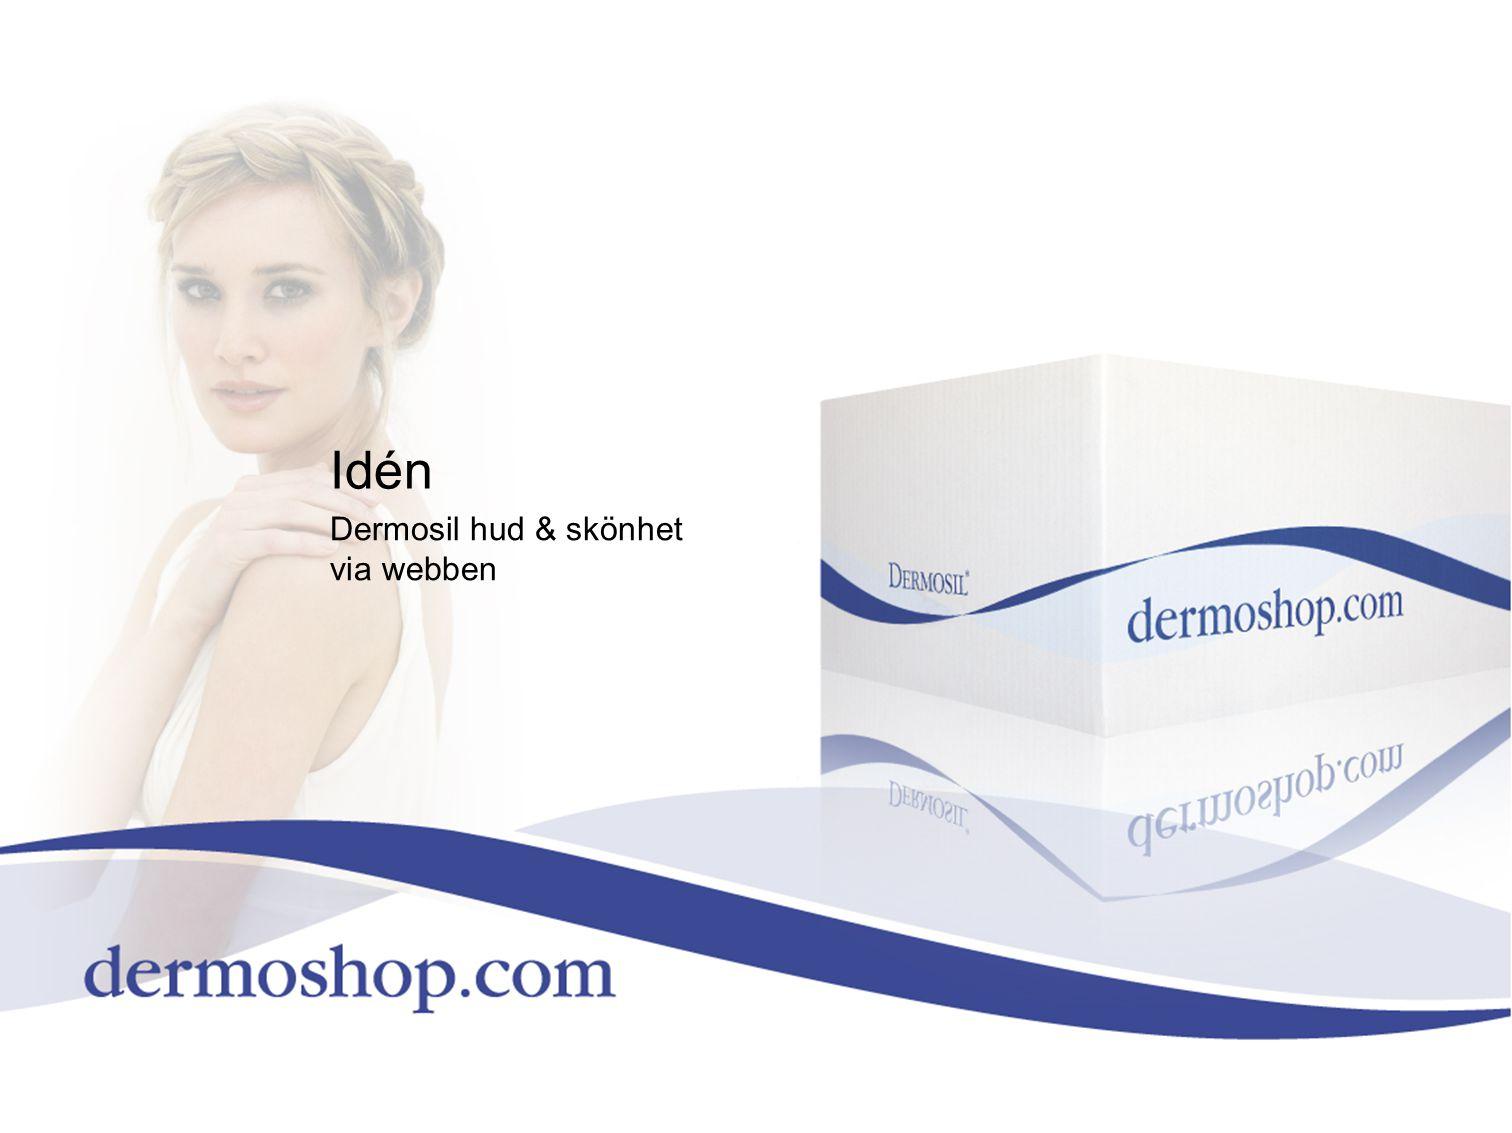 Idén Dermosil hud & skönhet via webben